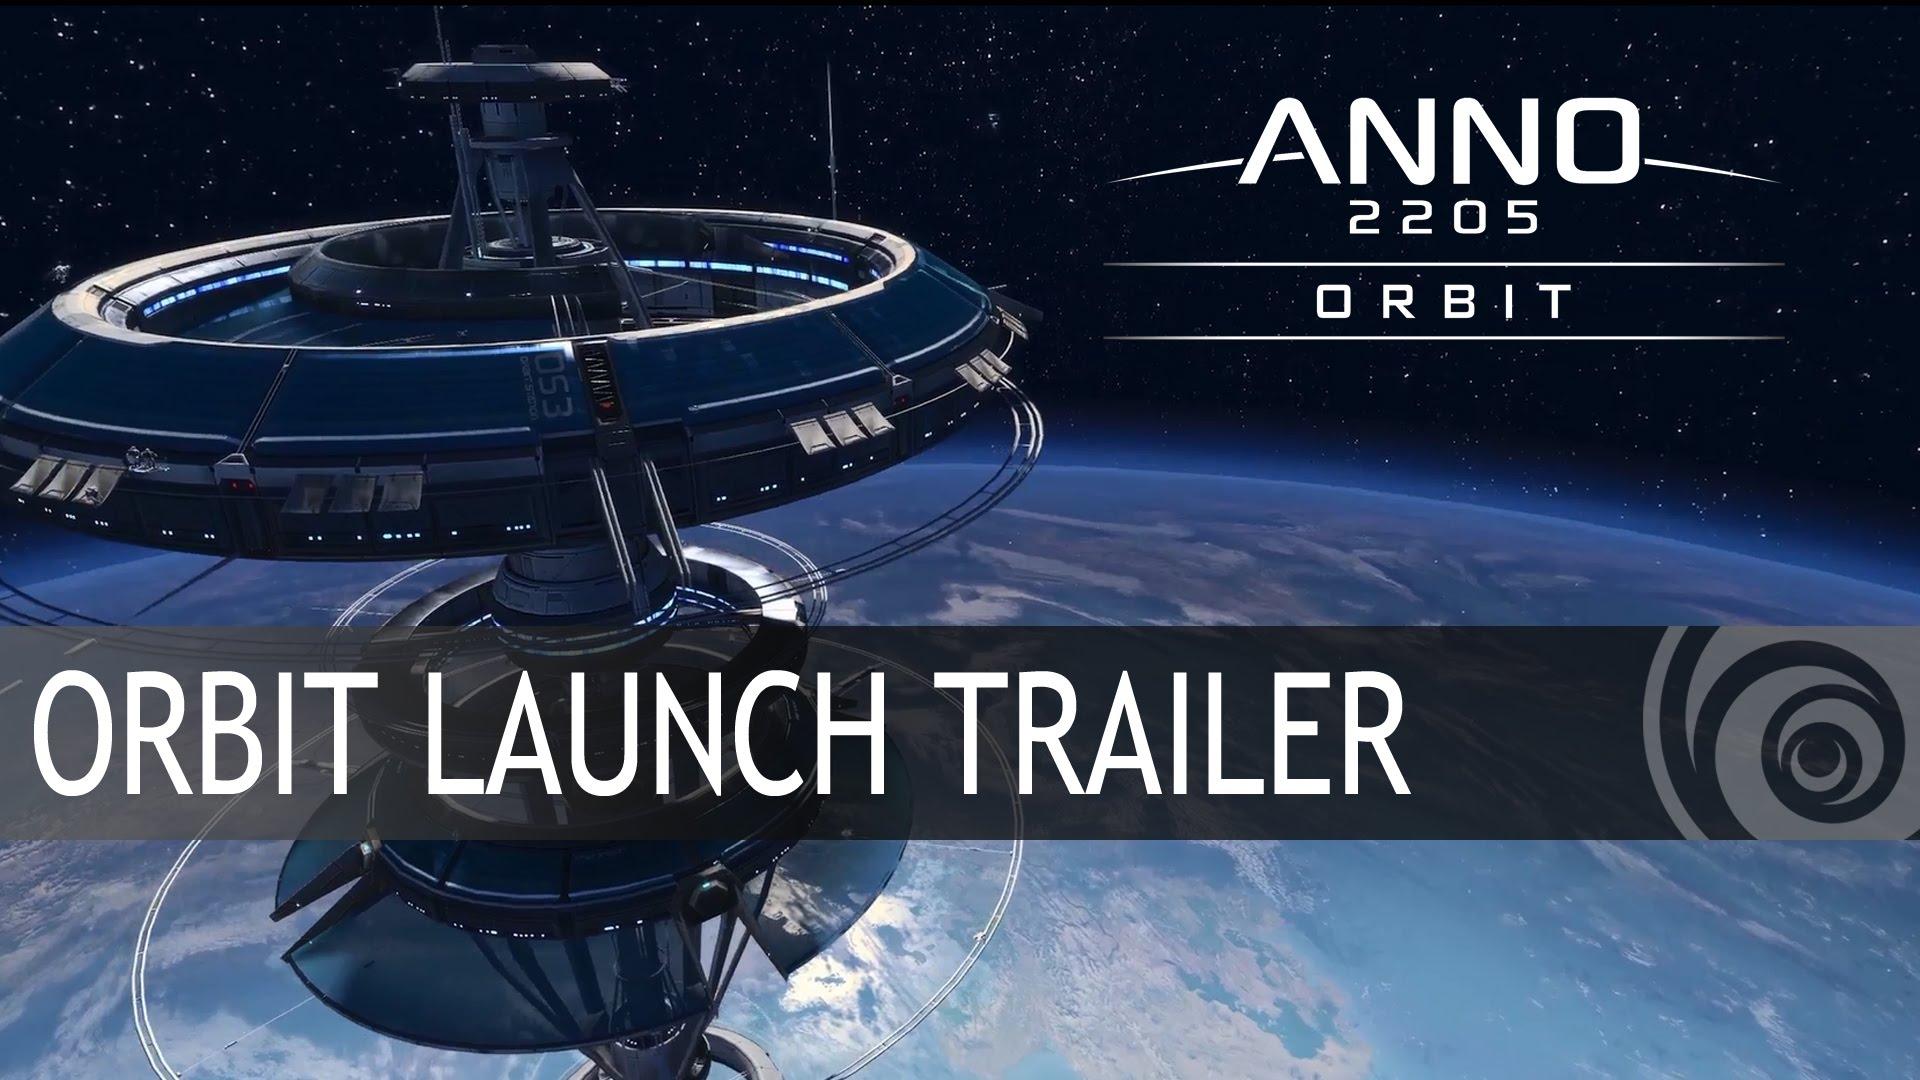 ANNO 2205: ORBIT DLC LAUNCH TRAILER